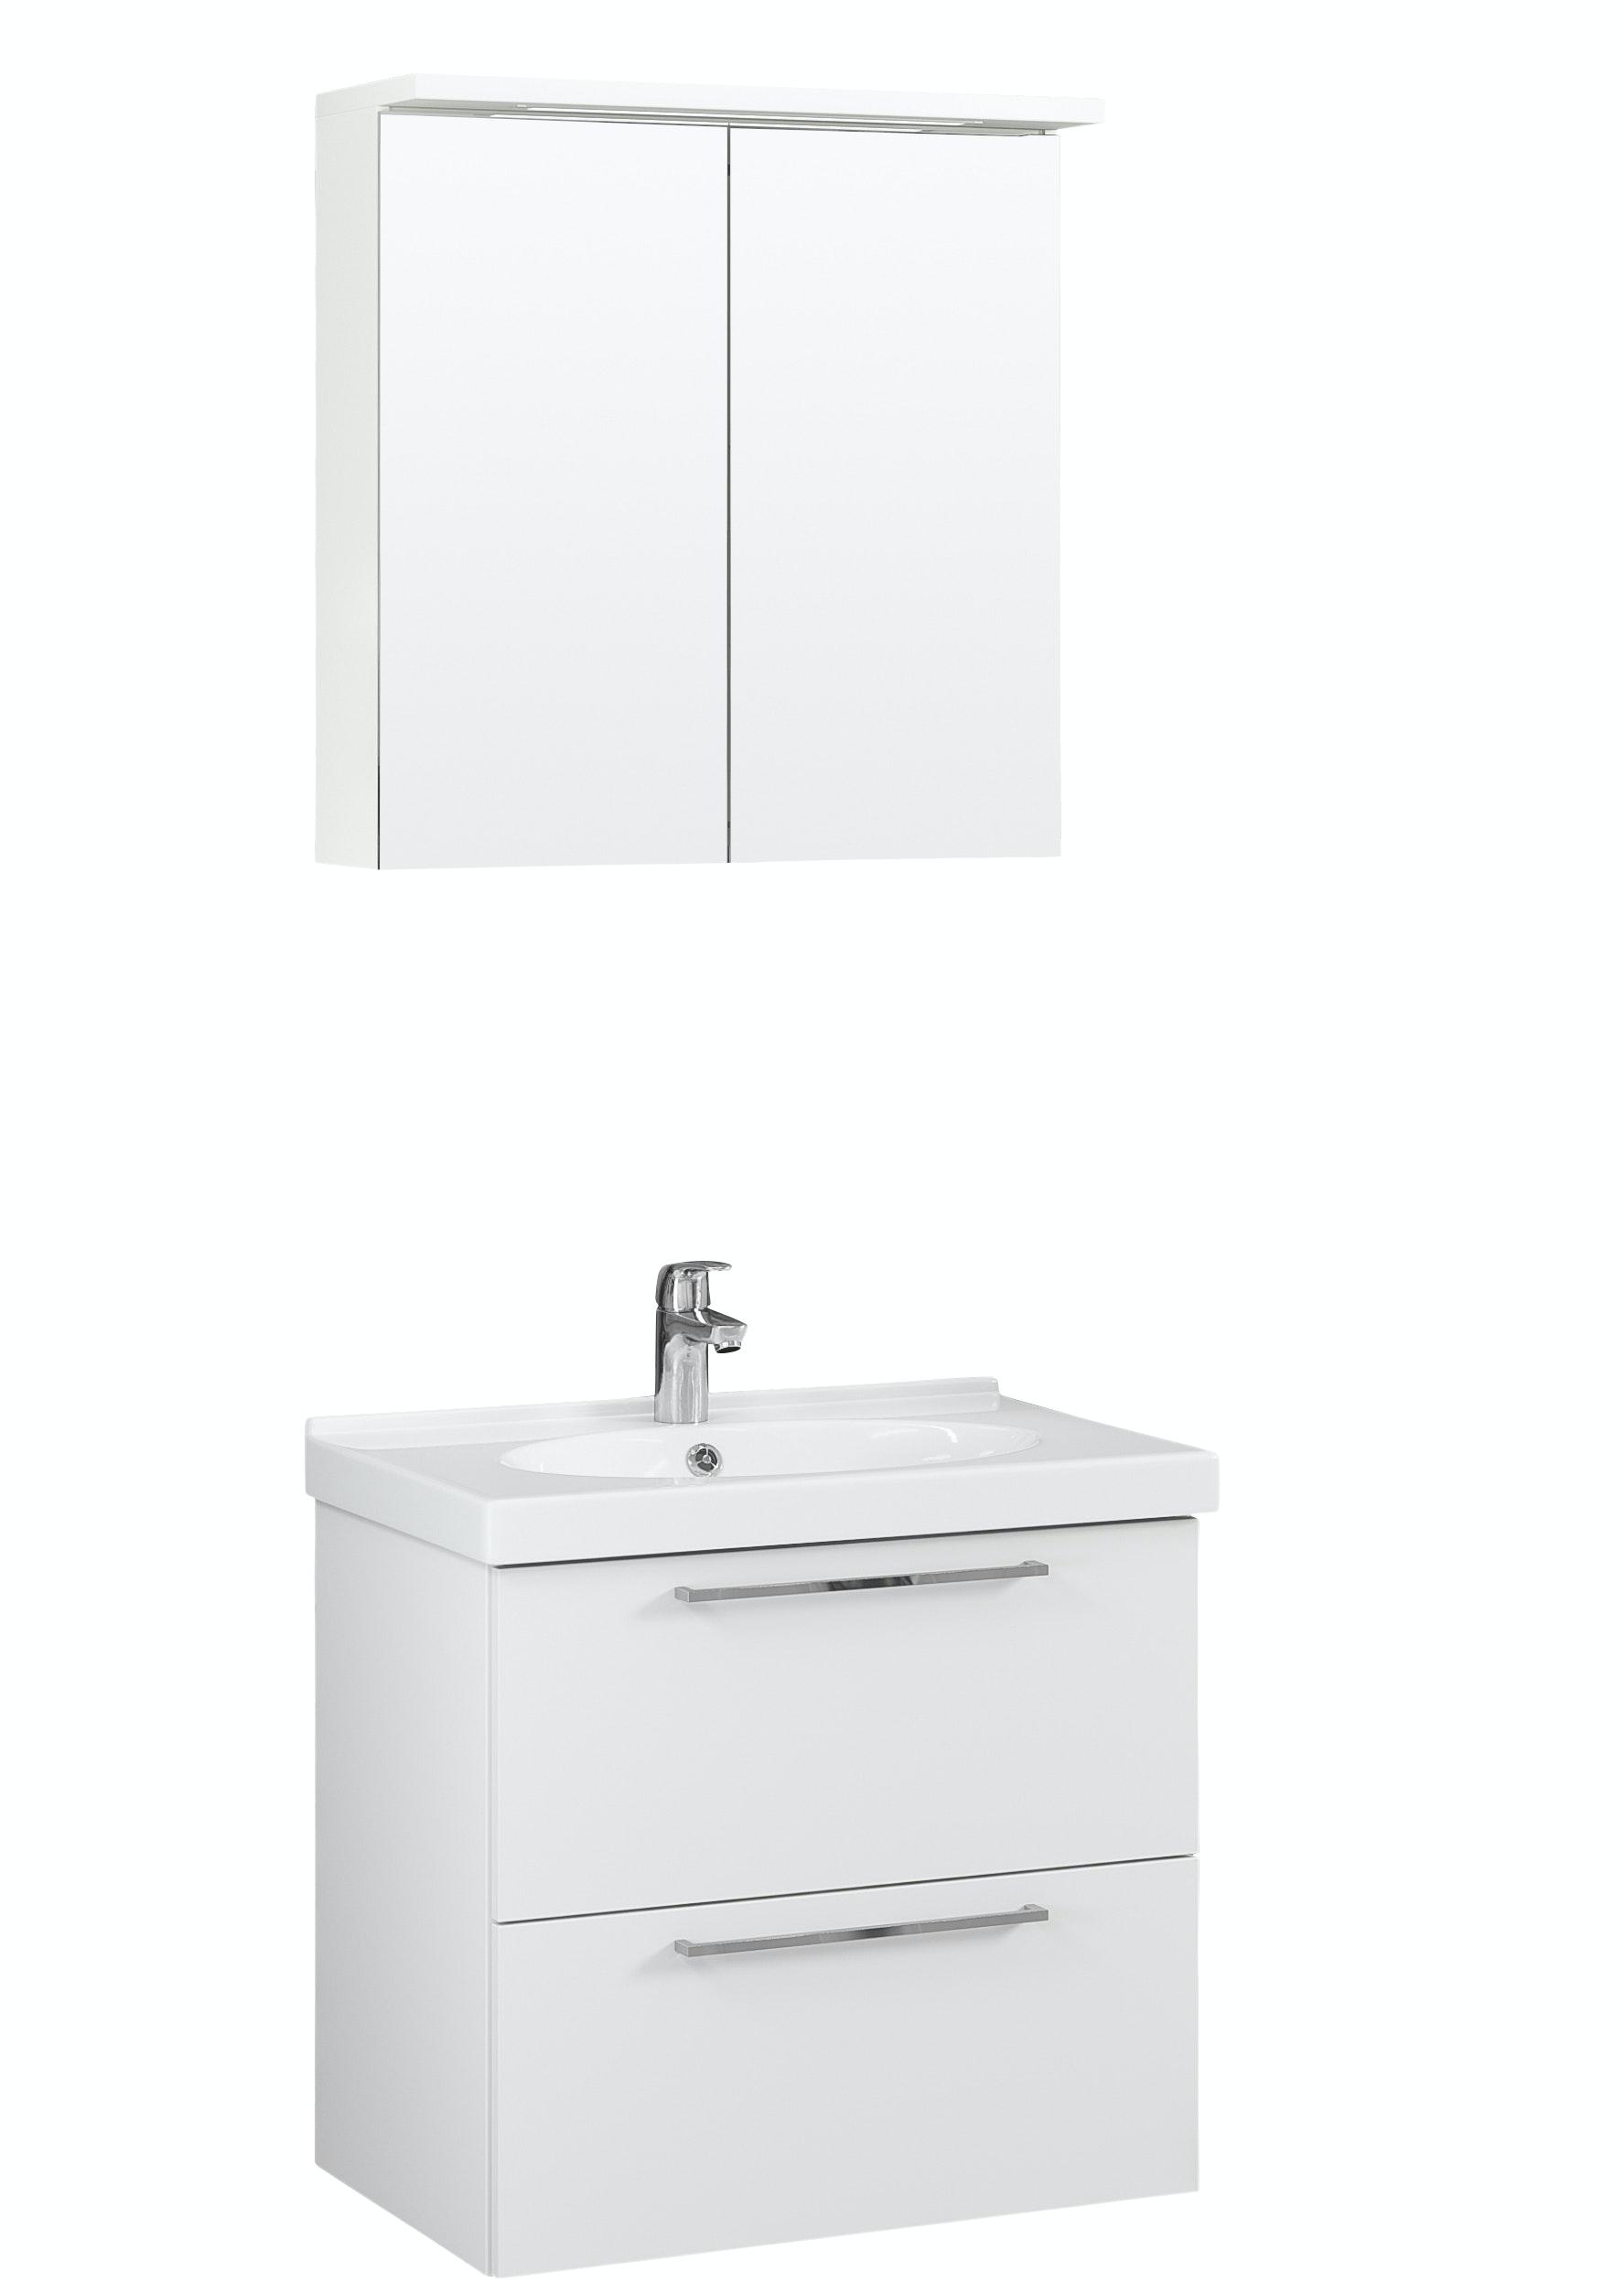 Möbelpaket Temal Trend 72X45 Vit Med Spegelskåp